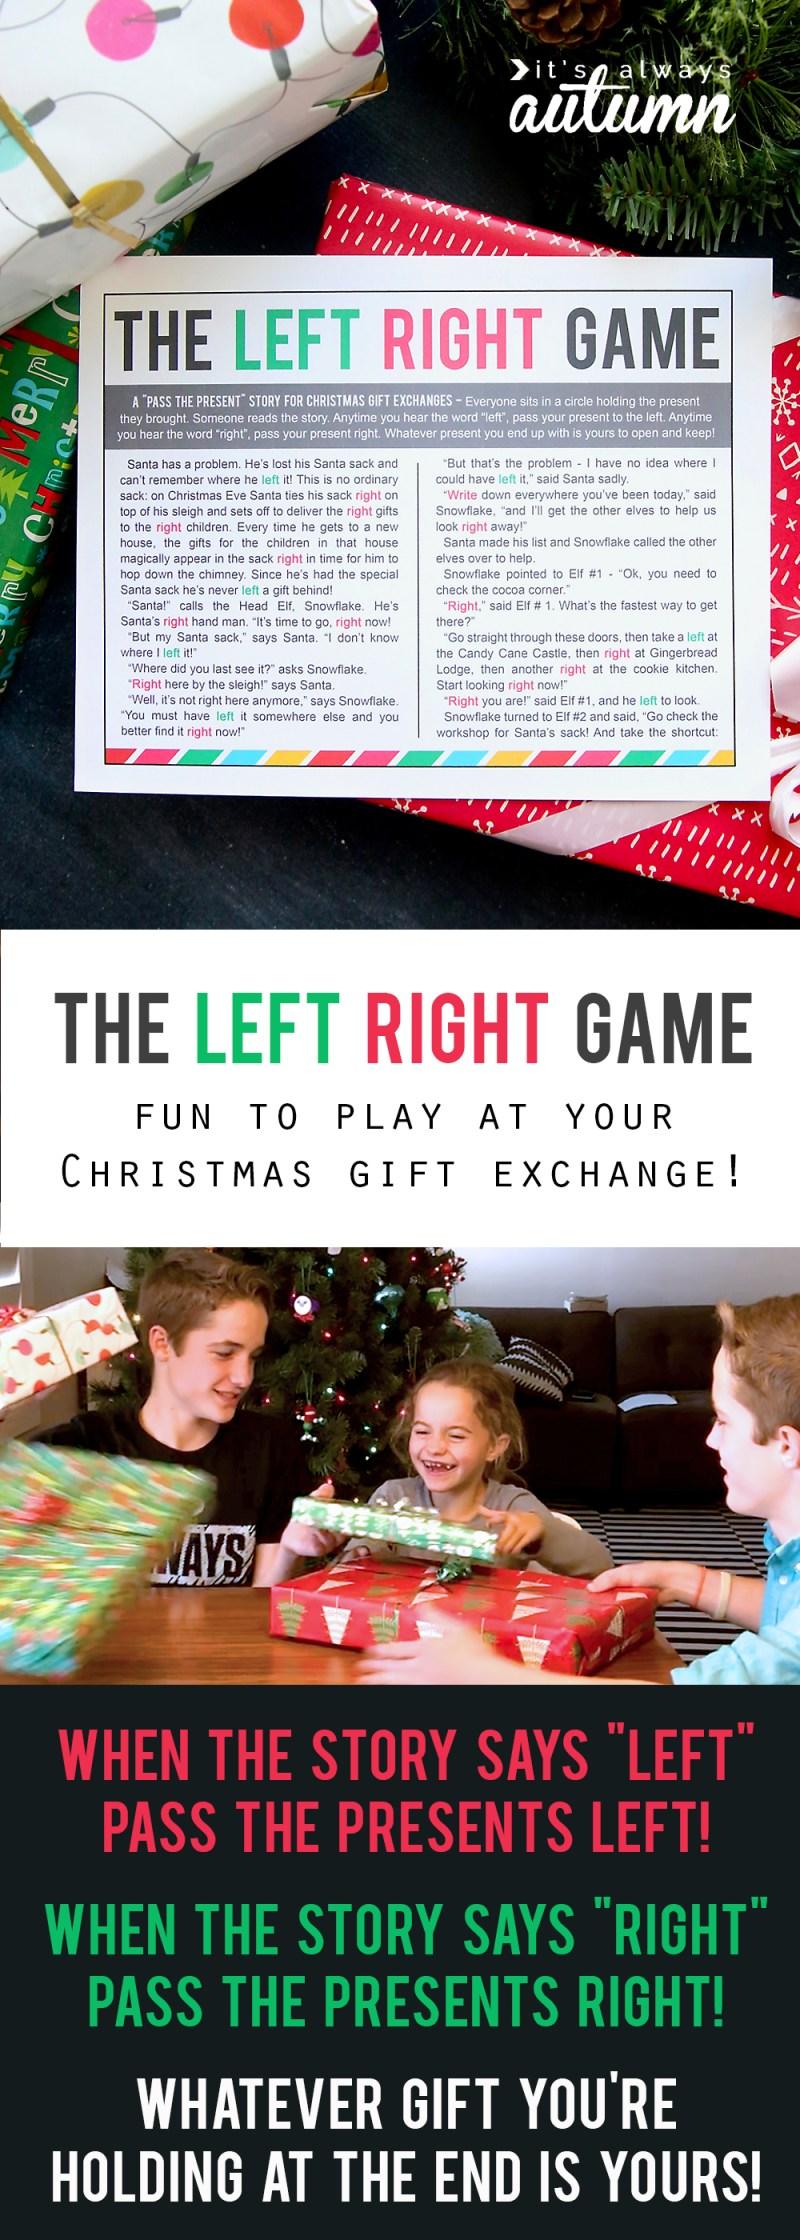 Christmas Gift Exchange Game Left Right Across Story | Dealssite.co